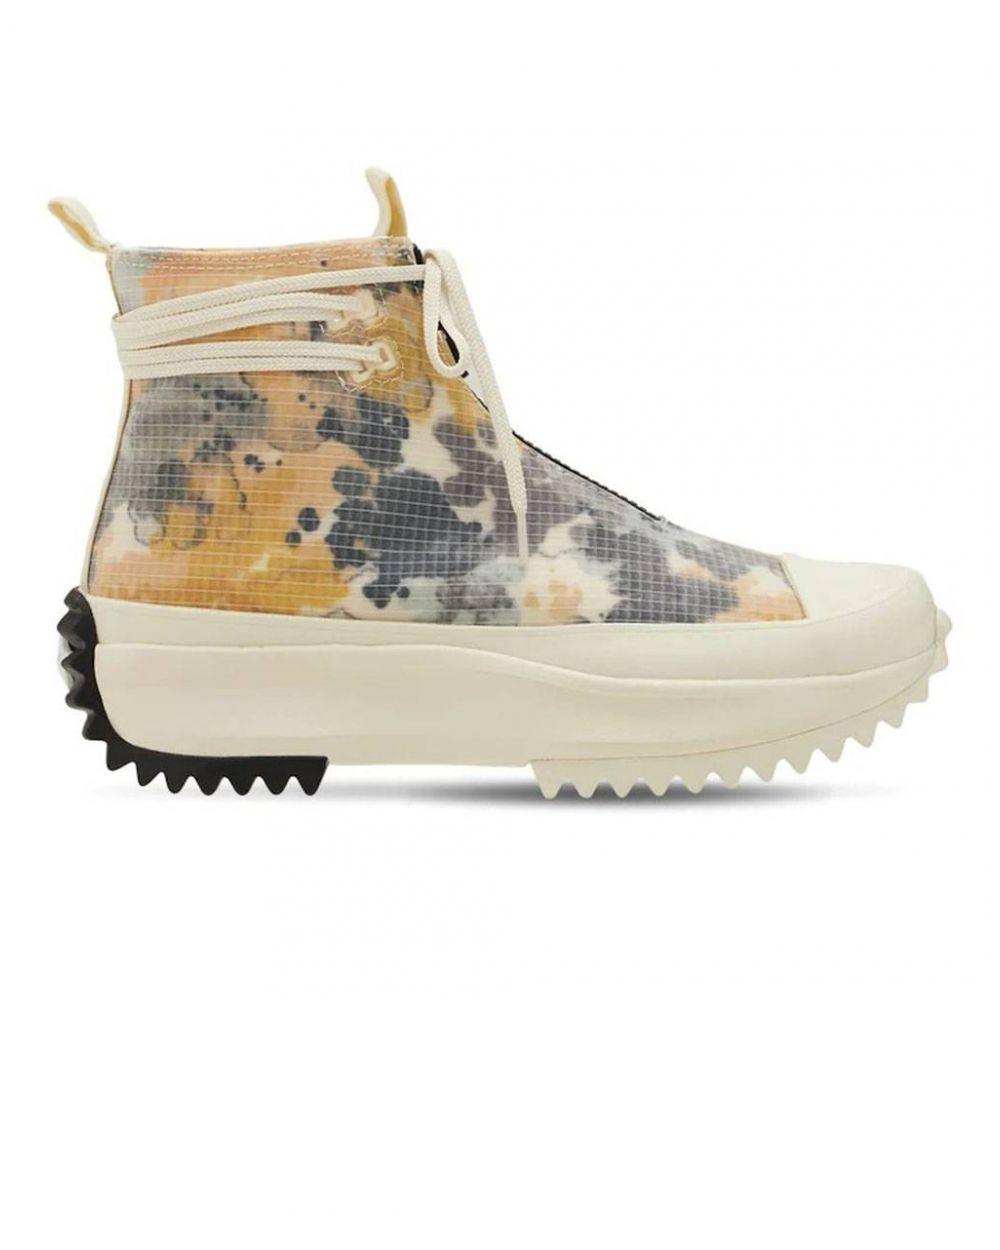 Converse Woman Festival Run Star Hike High Top - Egret/White/Black Converse Sneakers 125,00€